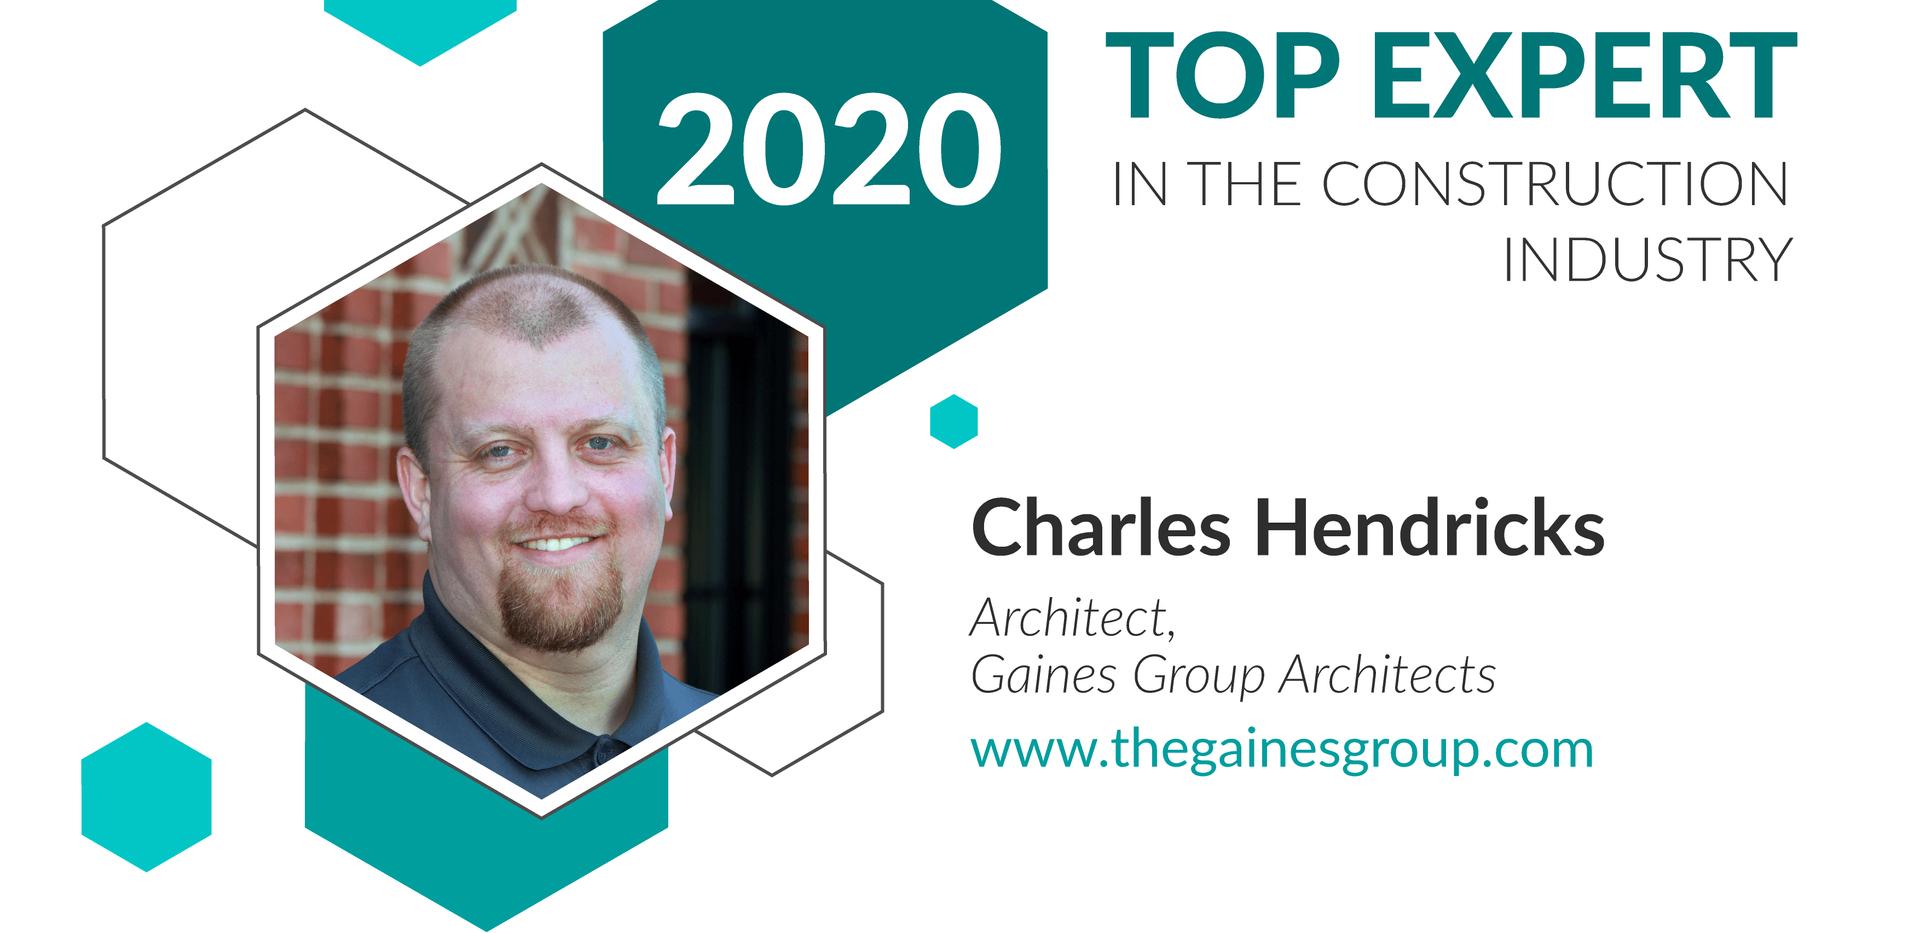 FIXR 2020 Top Expert in the Construction Industry